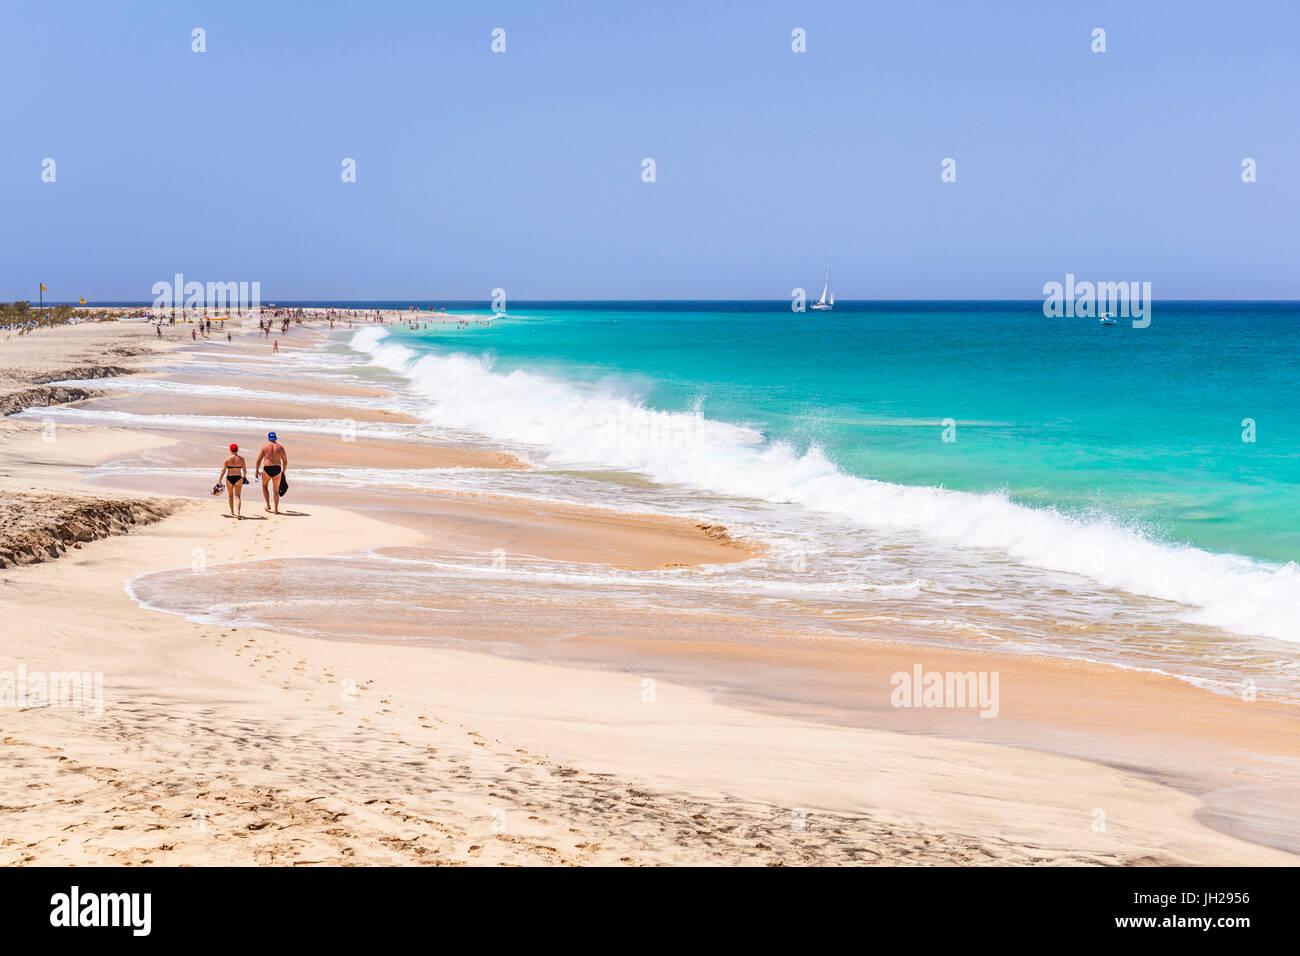 Tourists walking along the sandy beach, Ponta Preta beach, Santa Maria, Sal Island, Cape Verde, Atlantic, Africa Stock Photo